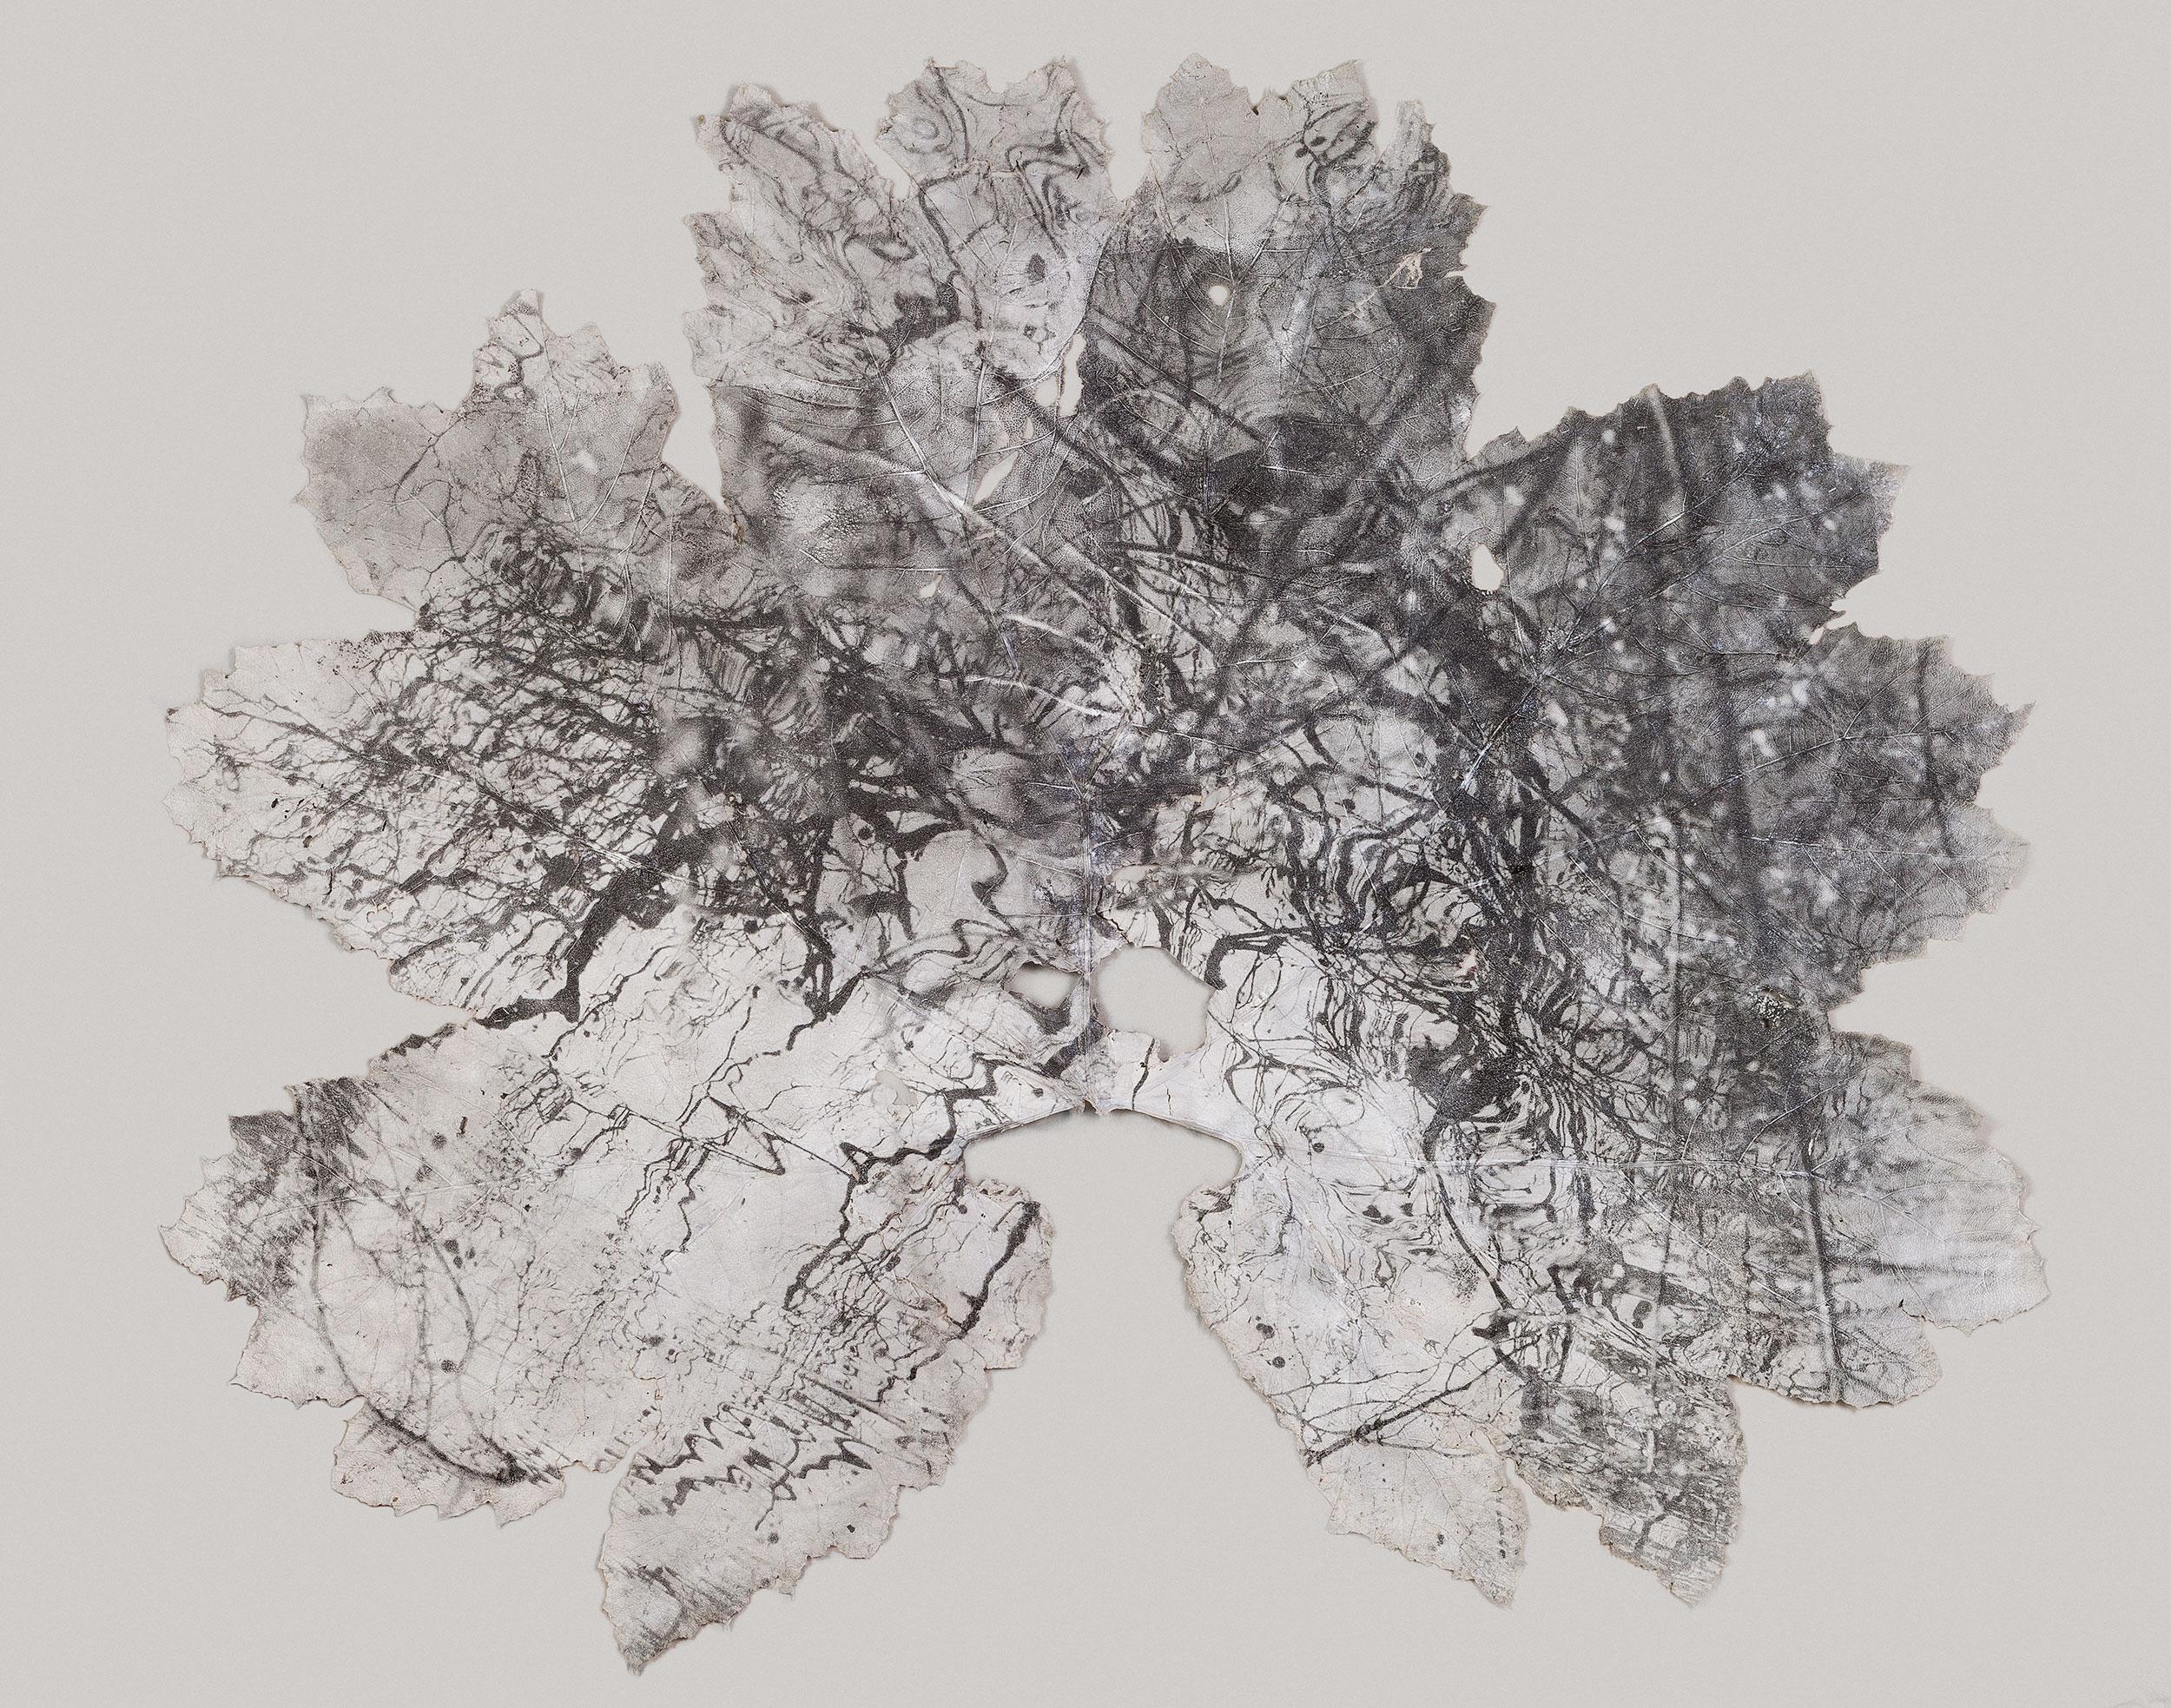 Silver gelatin print on Gunnera Manicata leafUntitled - 240cm x 220cm - Dominique Lacloche